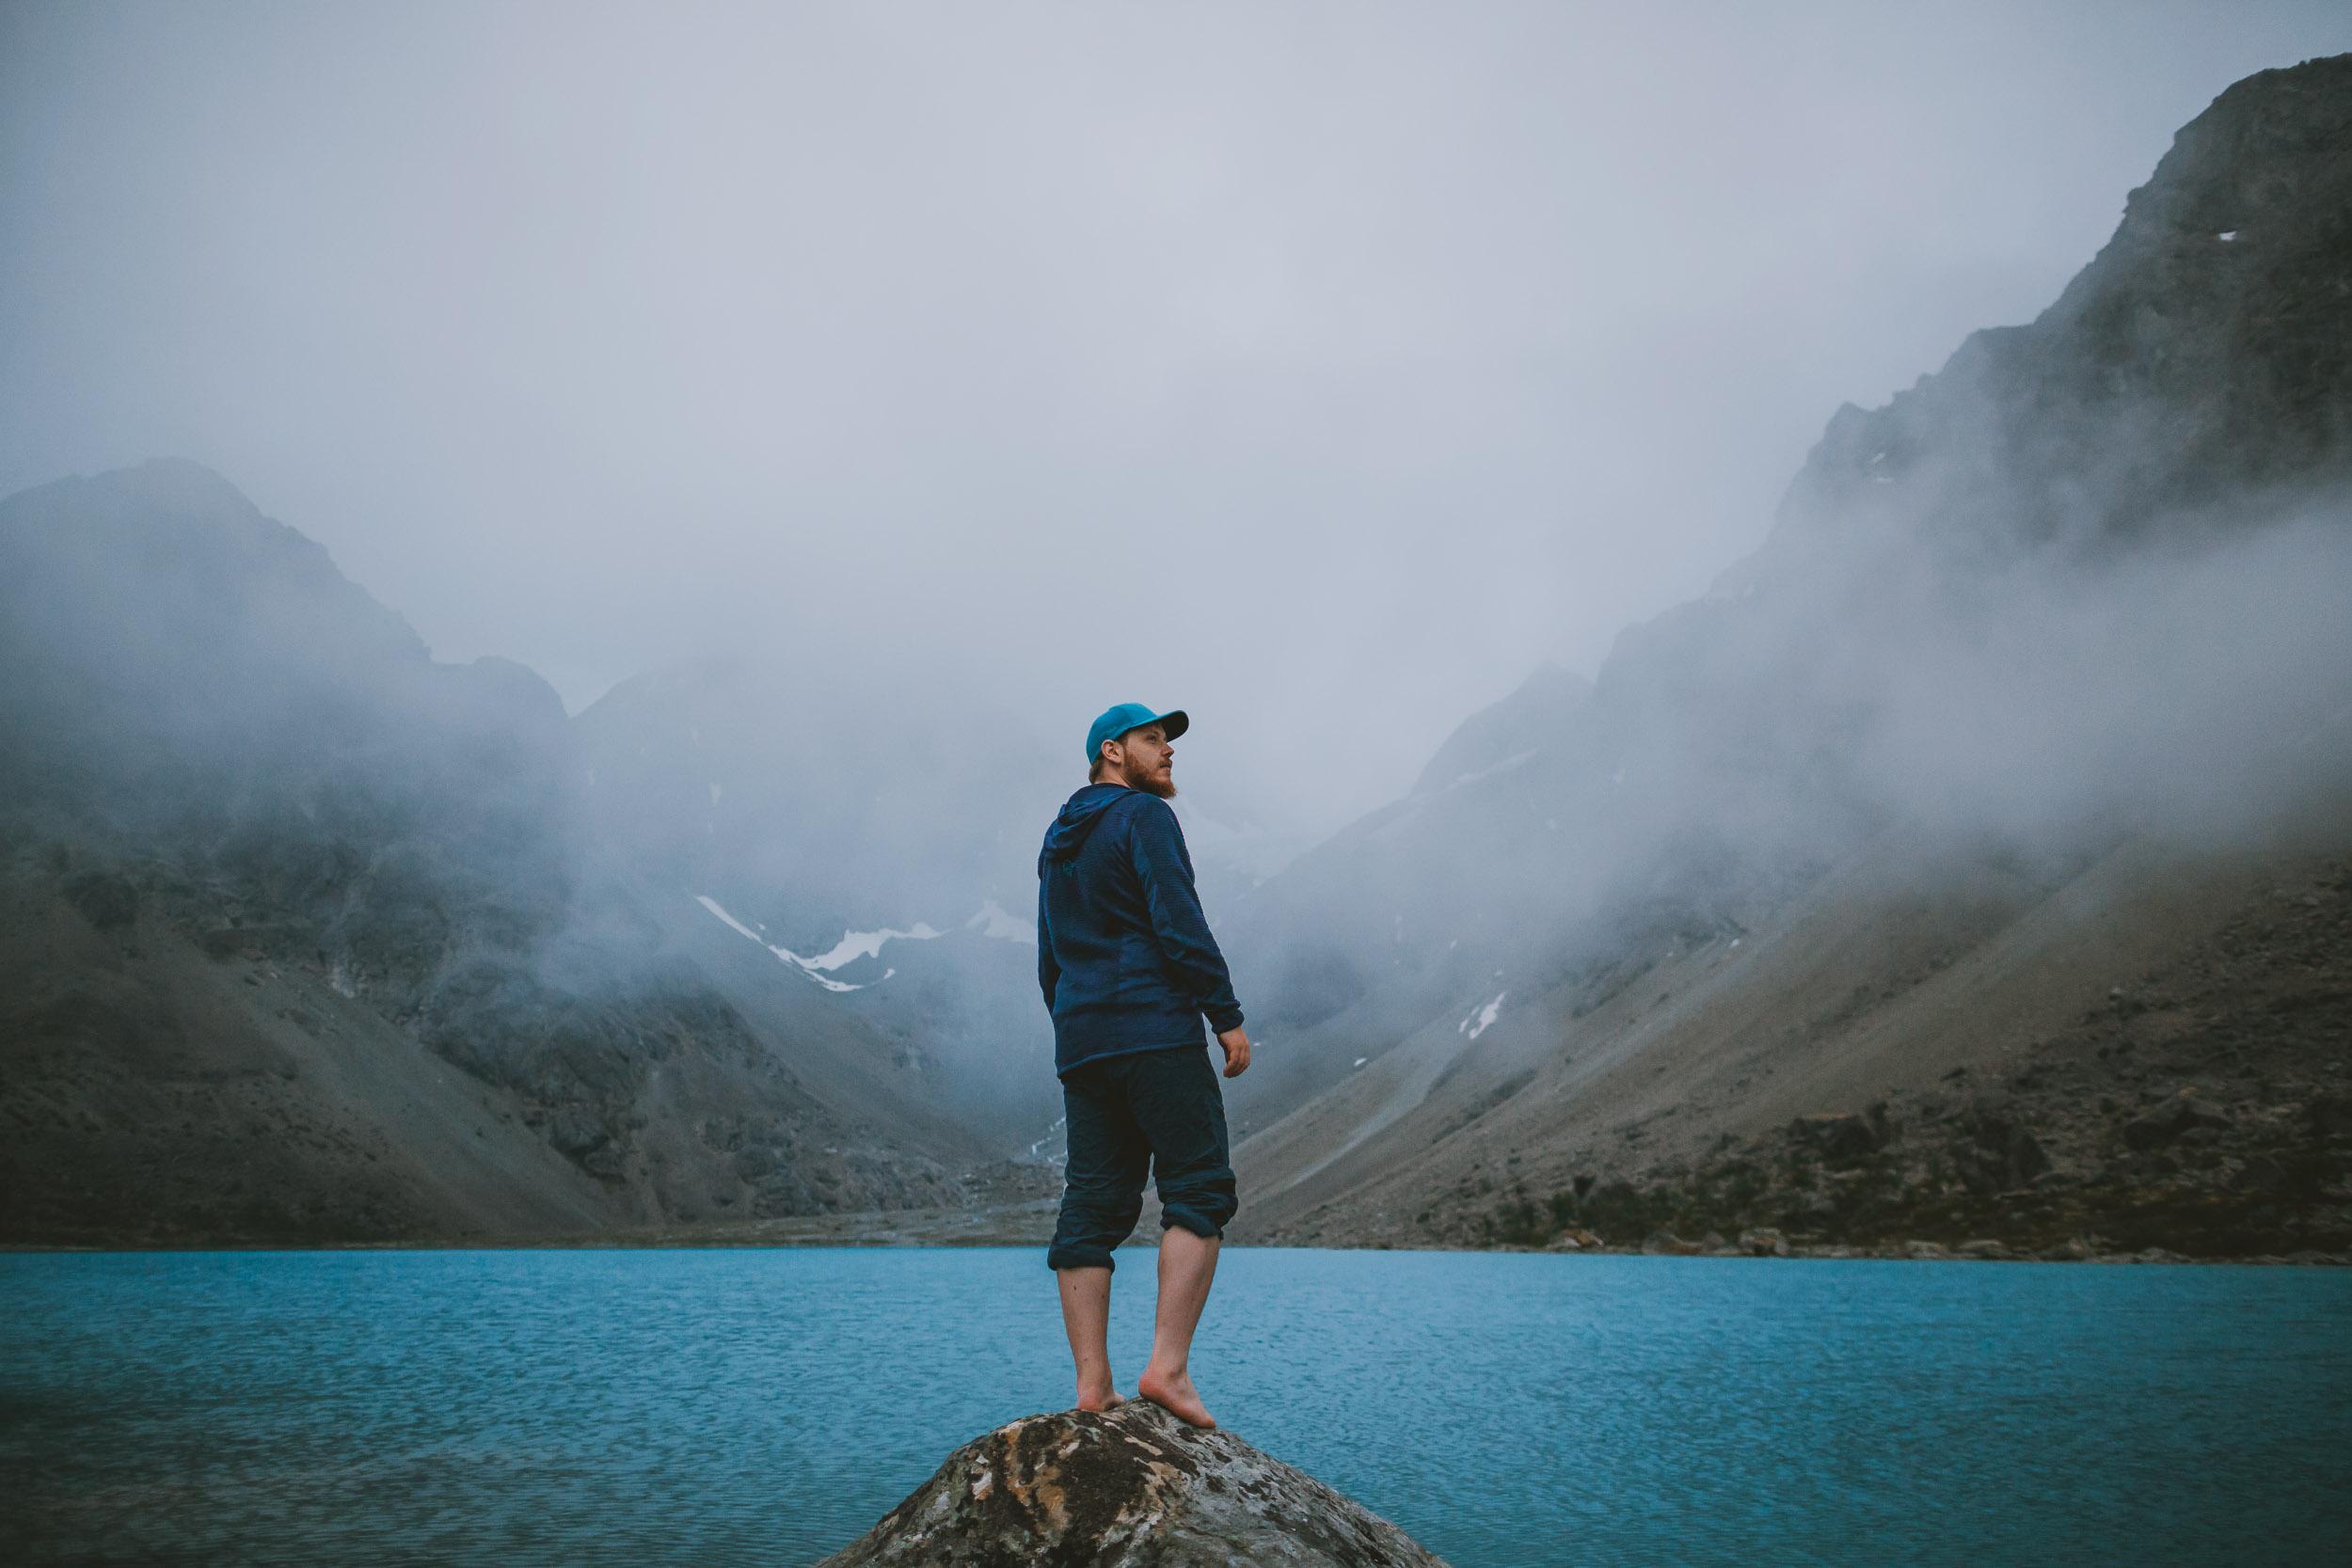 Mann står på stein foran Blåisvatnet i Lyngen